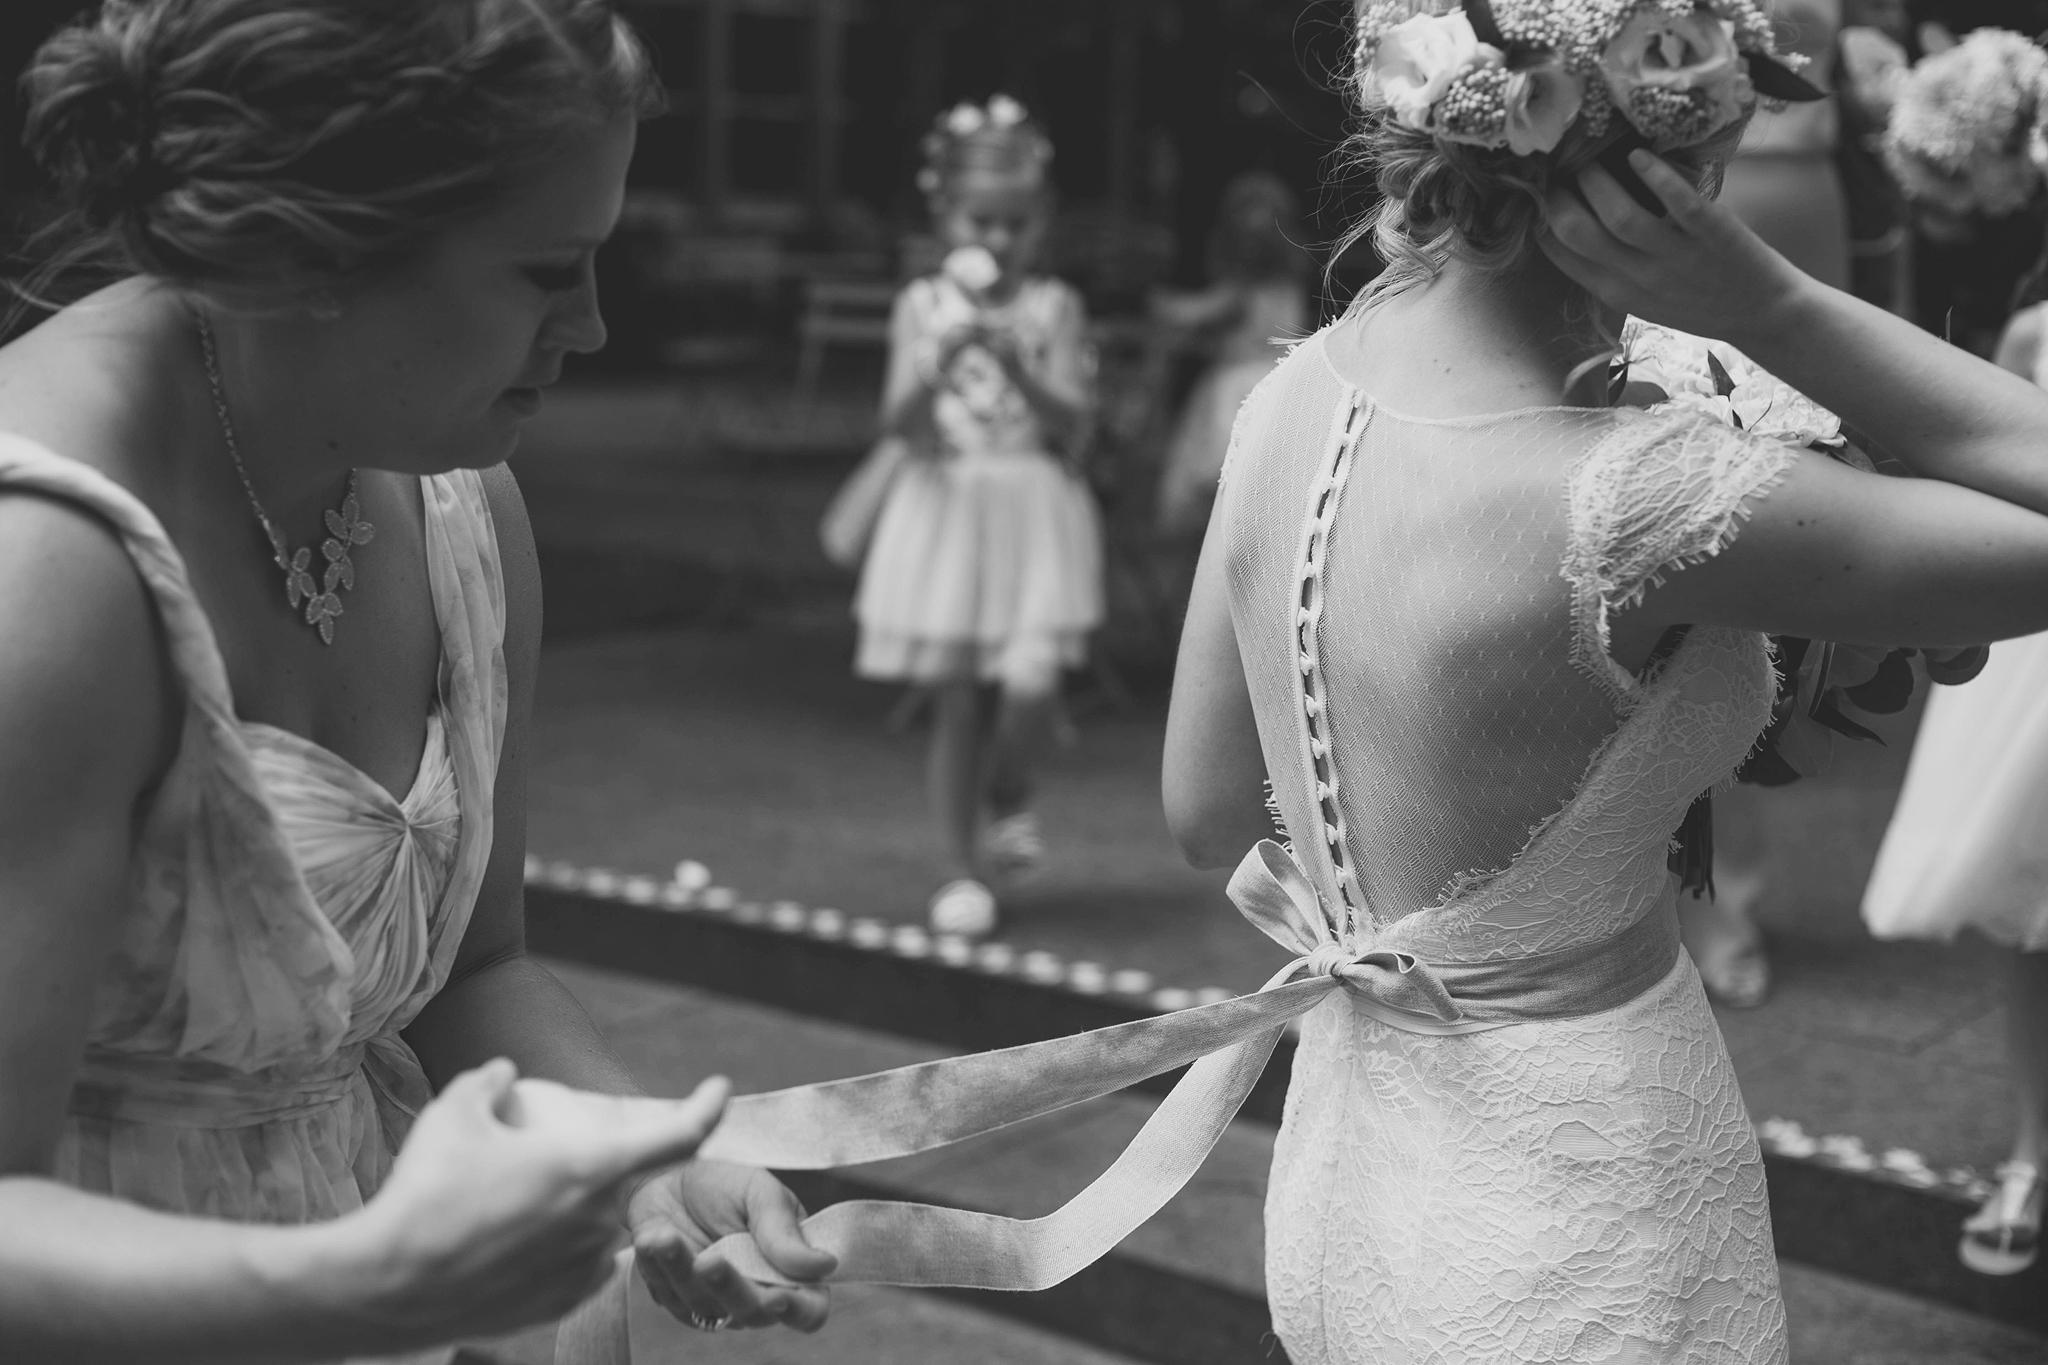 Cincinnati-Dayton-OH-Traveling-Wedding-Photographer-Rhinegeist-Brewery-Ault-Park-21C-68.jpg